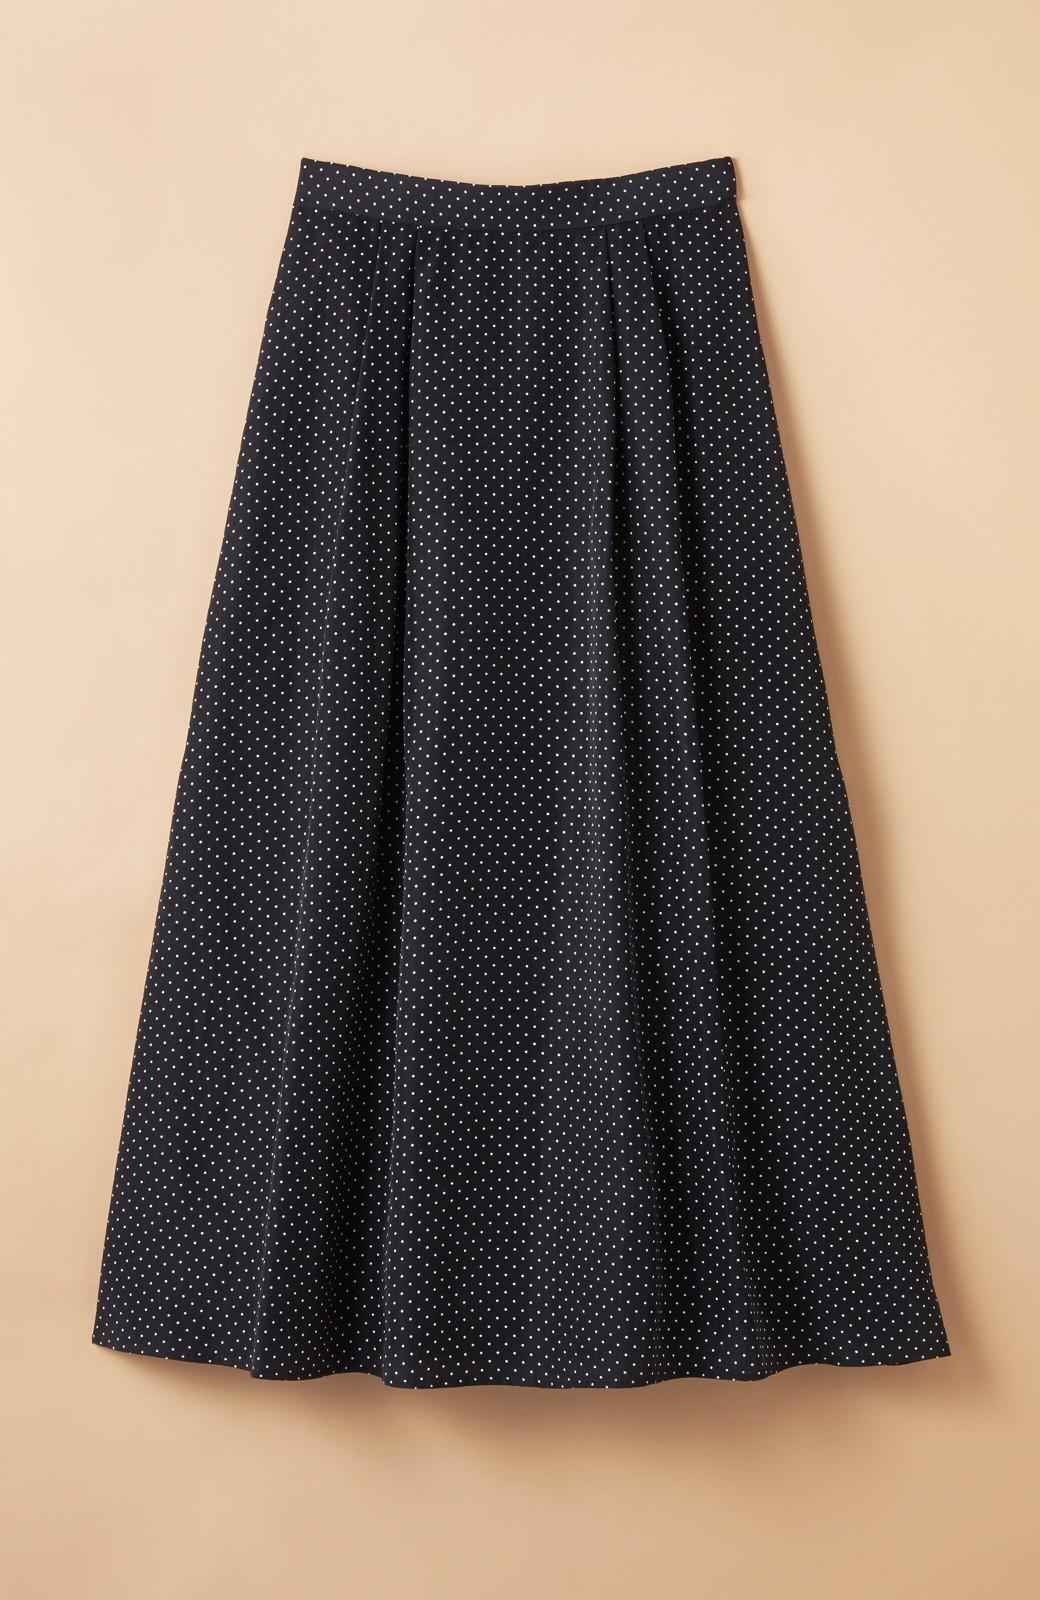 haco! ずっと着られる大人のドットロングスカート by que made me <ブラック系その他>の商品写真1